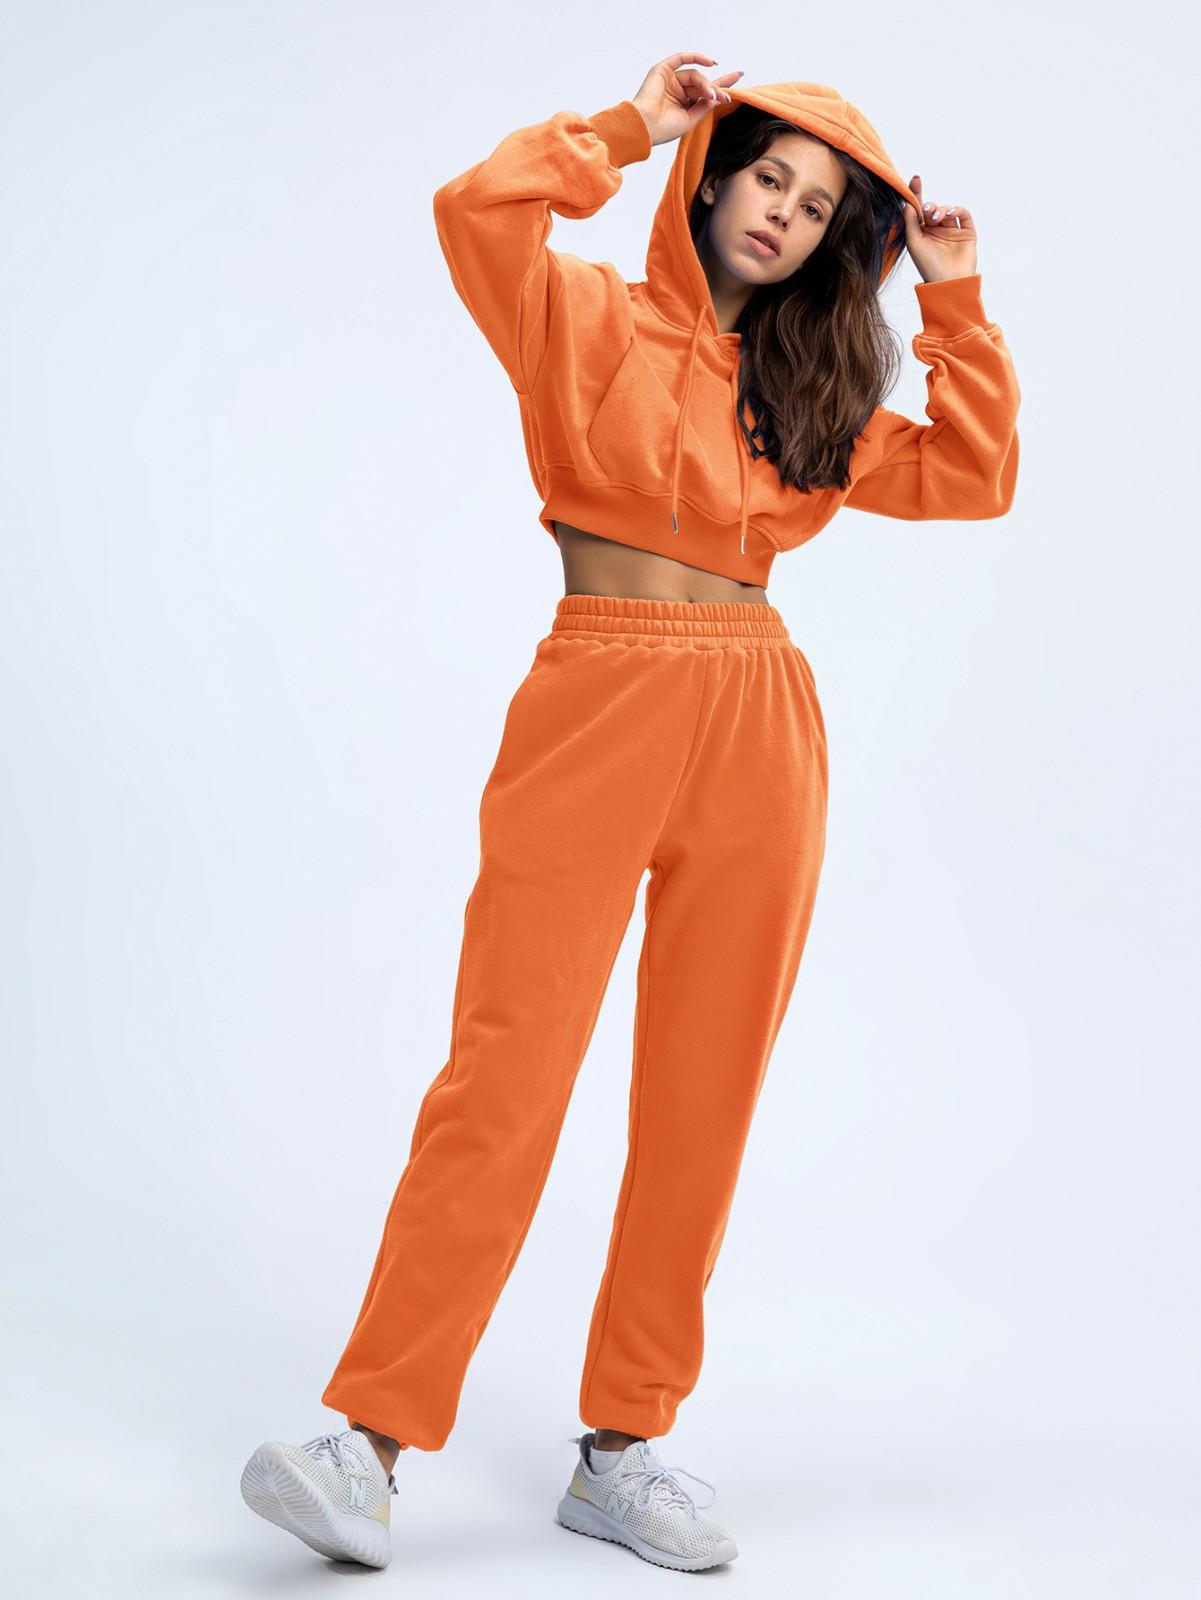 product-Ruiteng-Wholesale Women High Quality Sweatshirt Suit Hoodies Long Sleeve Crop Suit-img